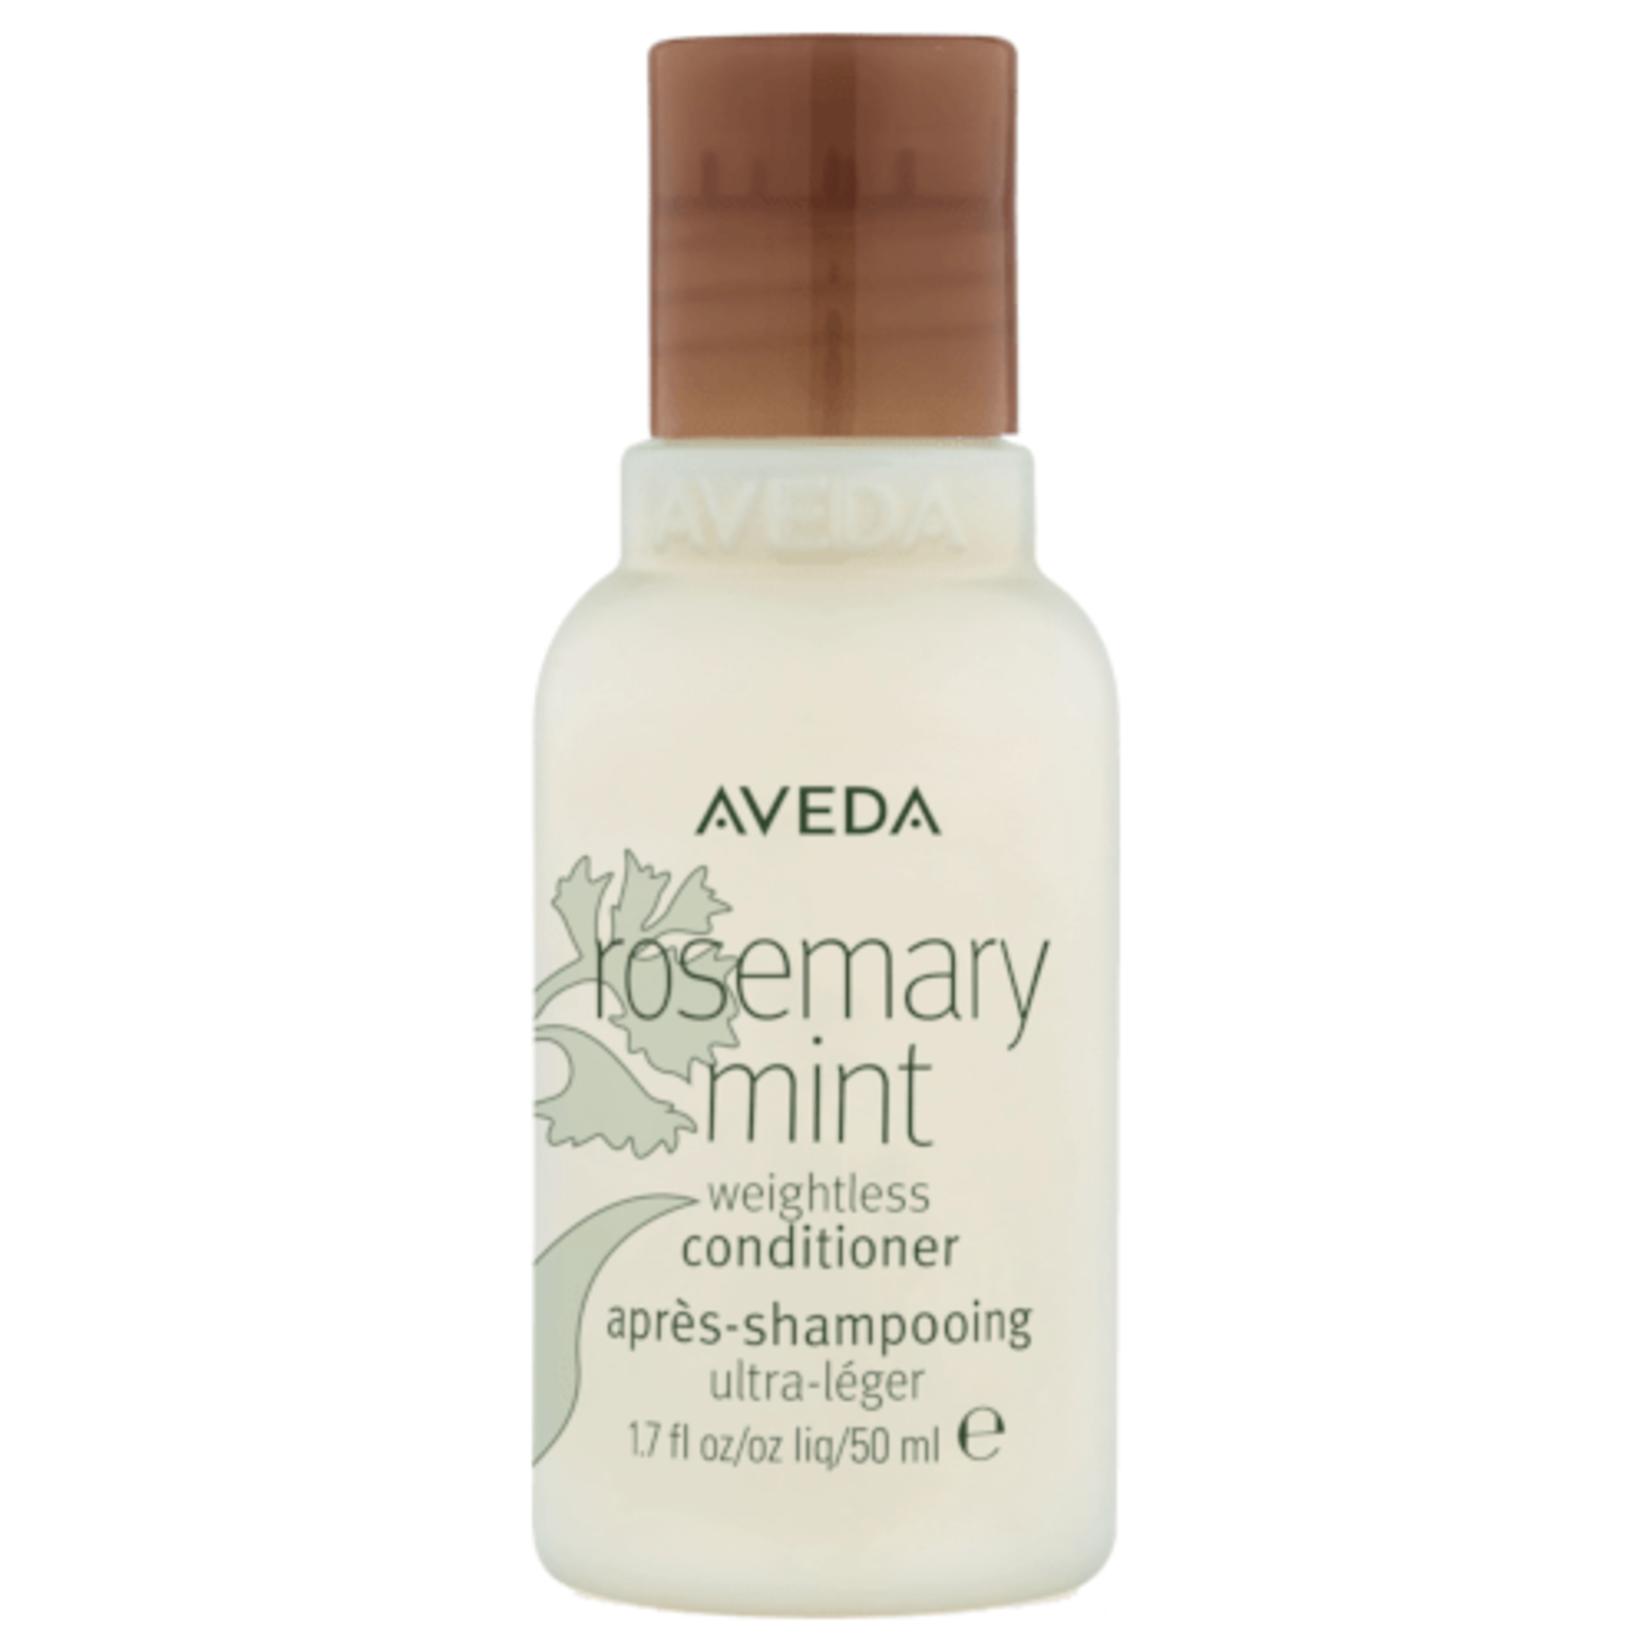 AVEDA Rosemary Mint Weightless Conditioner